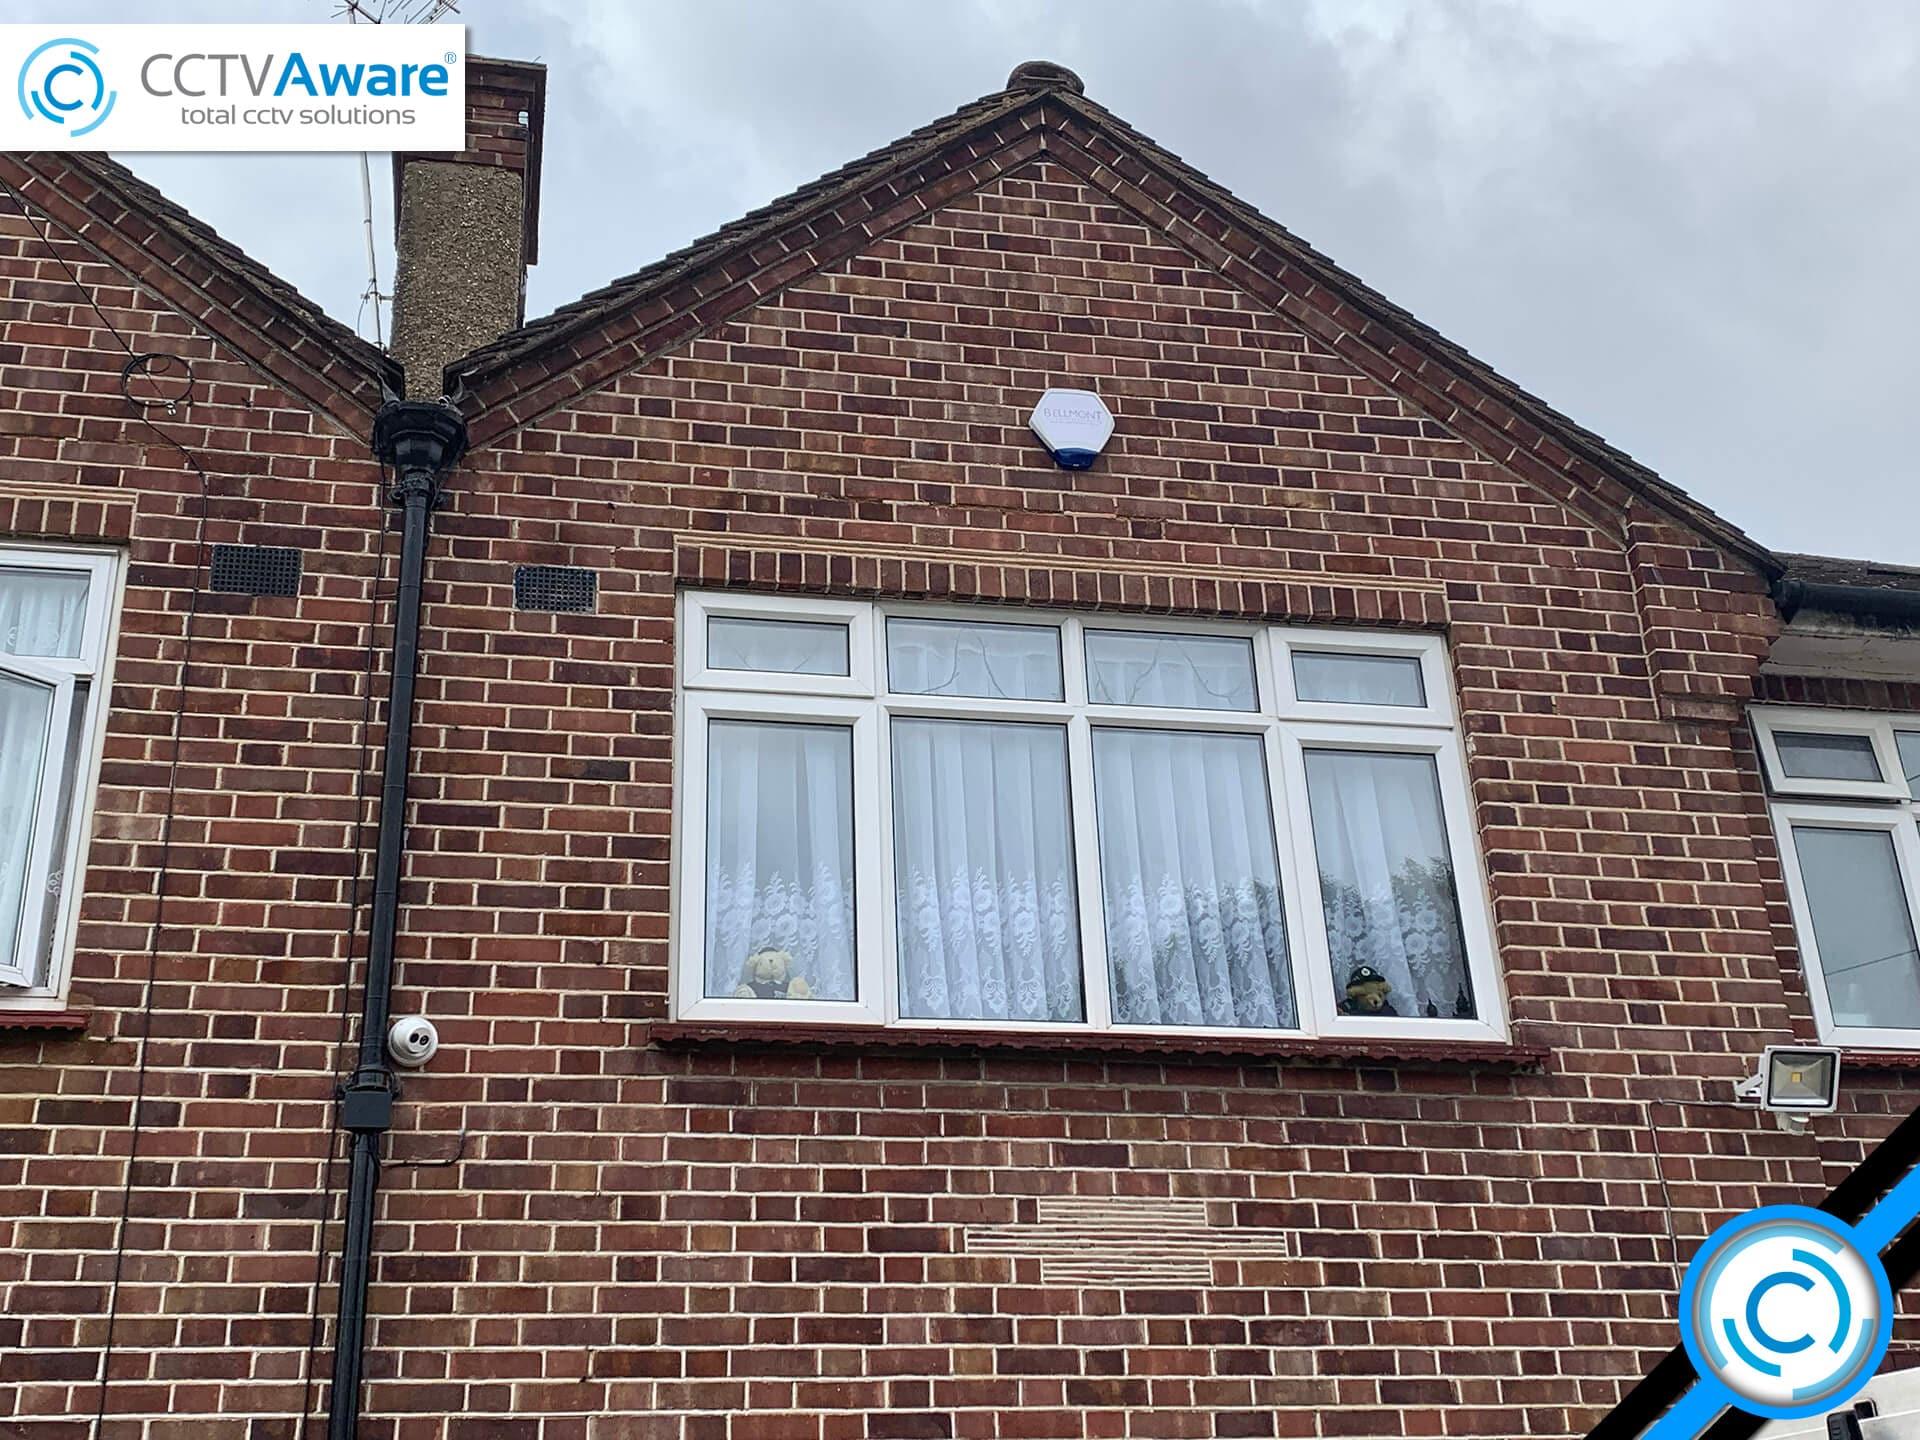 CCTV & Alarm Installation in Harrow